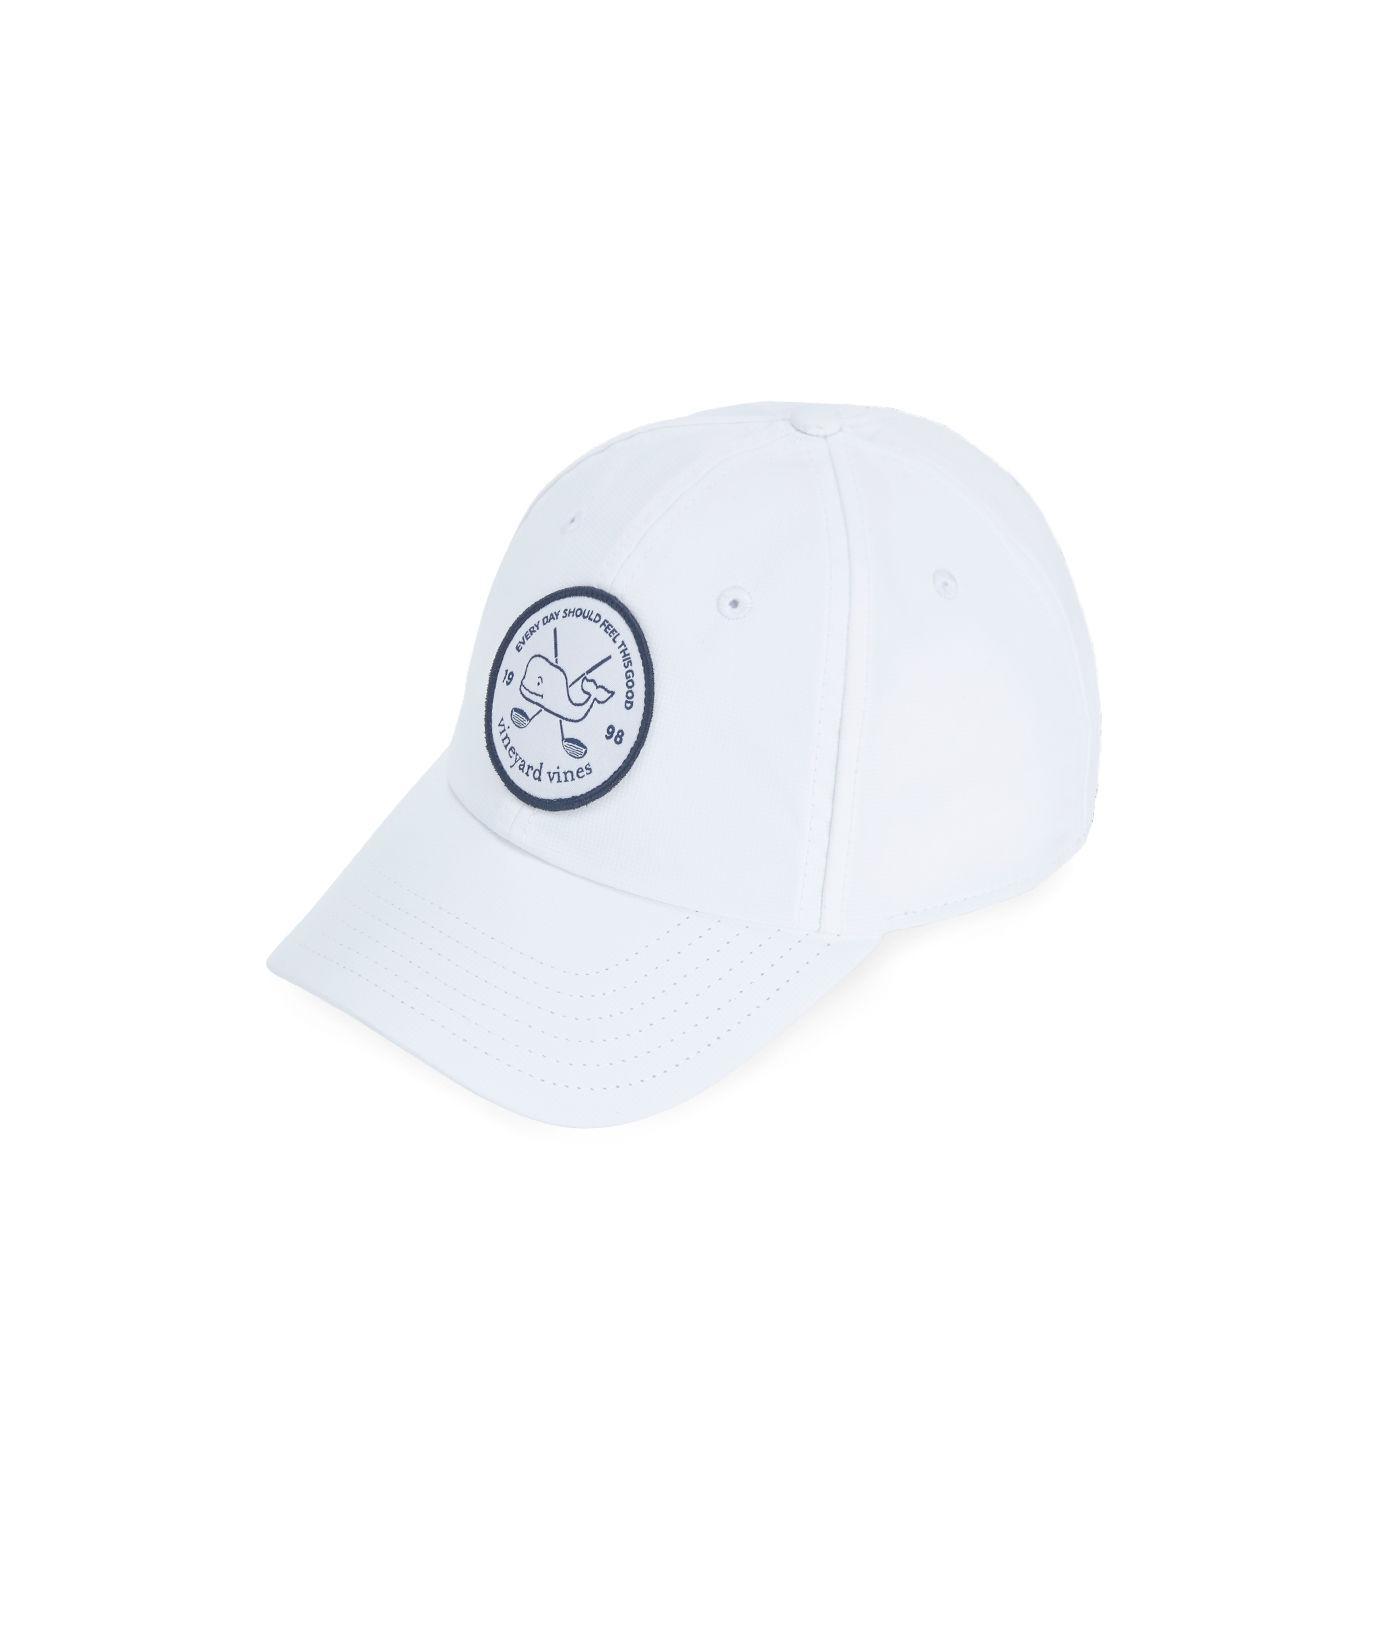 45c0ac46bf5 Lyst - Vineyard Vines Golf Patch Performance Baseball Hat in White ...